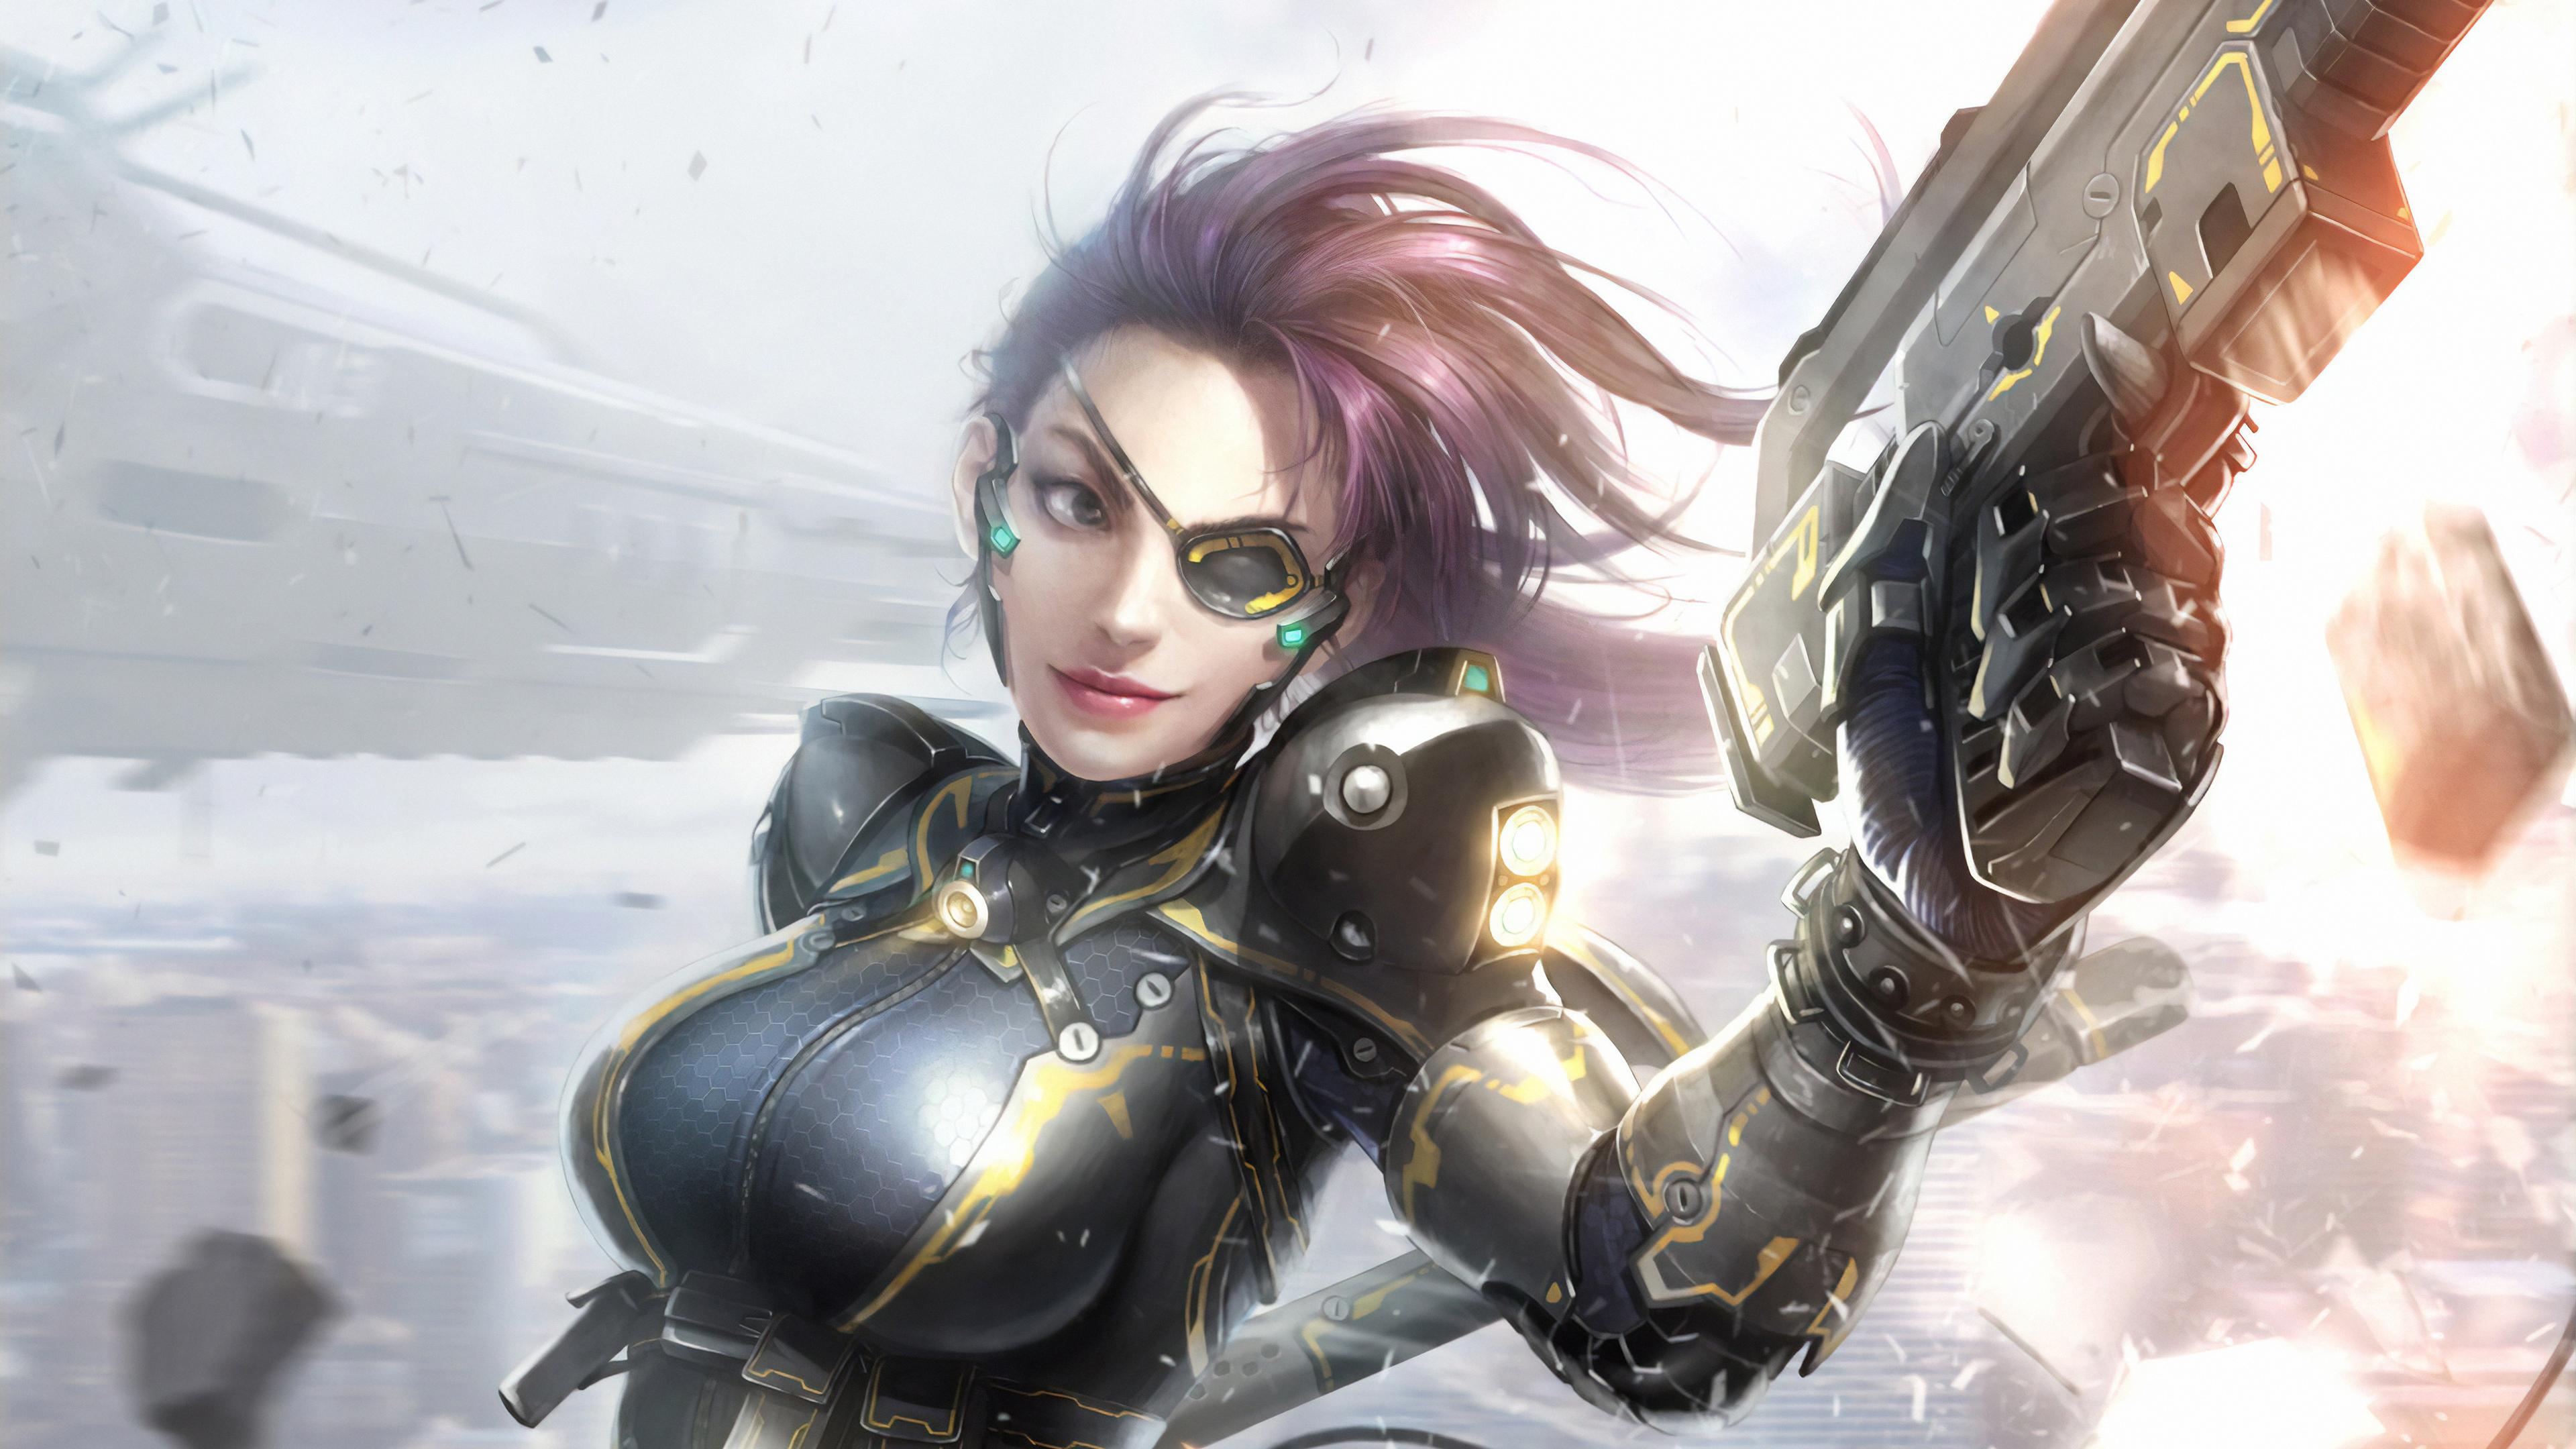 cyborg-girl-with-gun-4k-z5.jpg